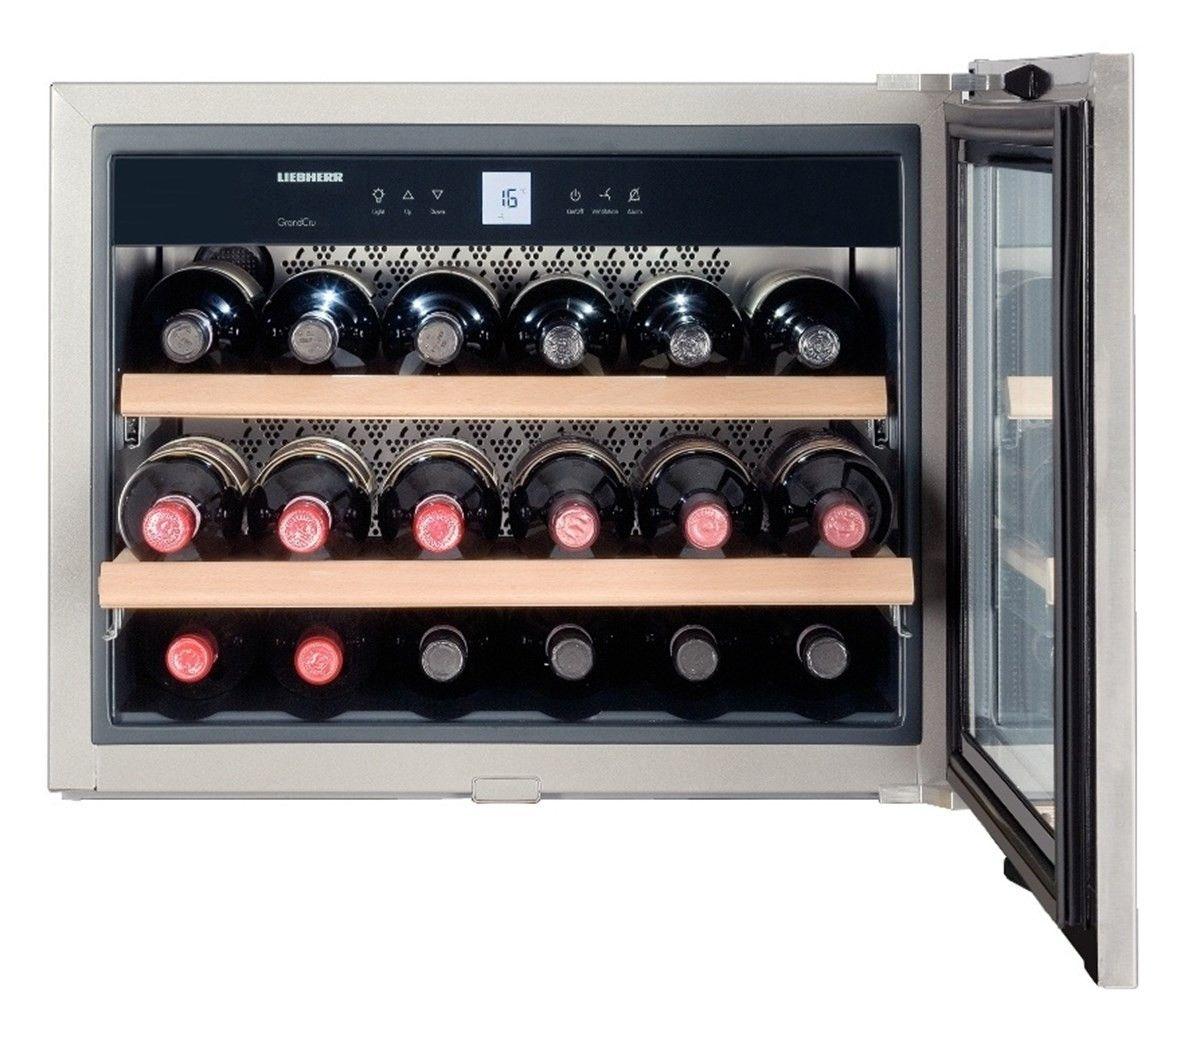 Liebherr Wkees 553 Grandcru Silver Wine Cooler Built In Wine Cooler Wine Storage Cabinets Wine Cabinets